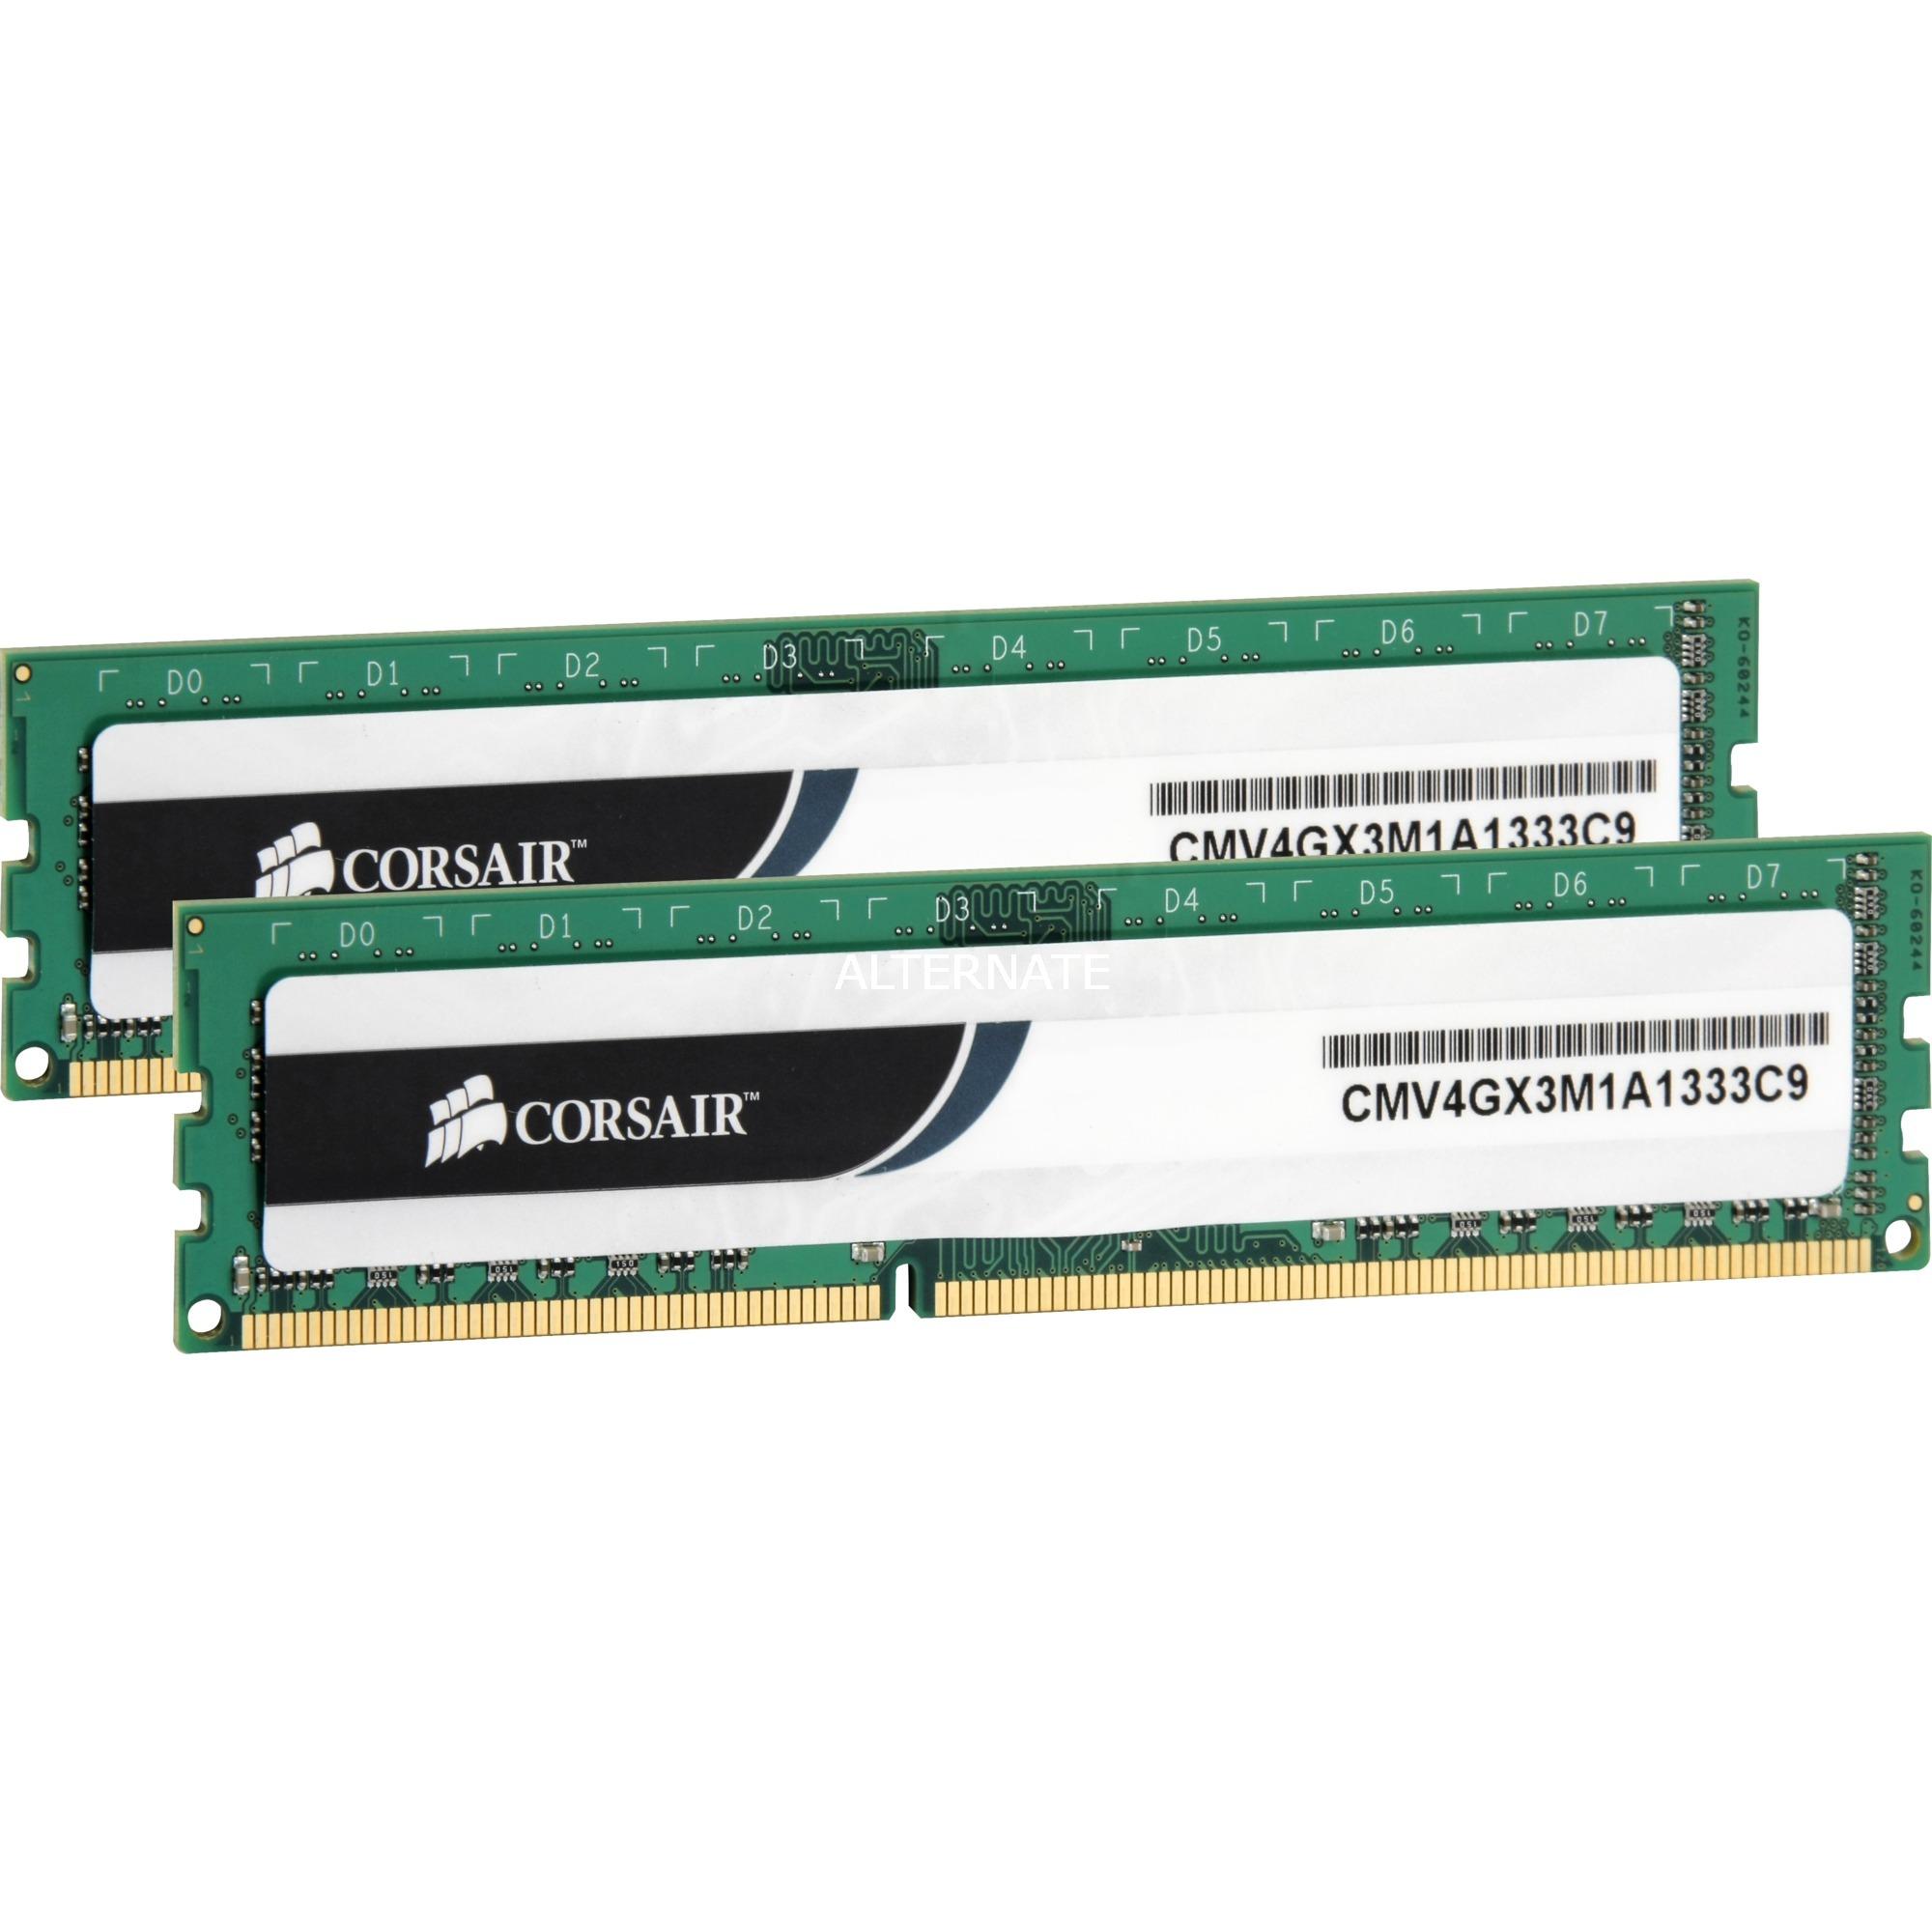 8GB DDR3 1333MHz módulo de memoria, Memoria RAM